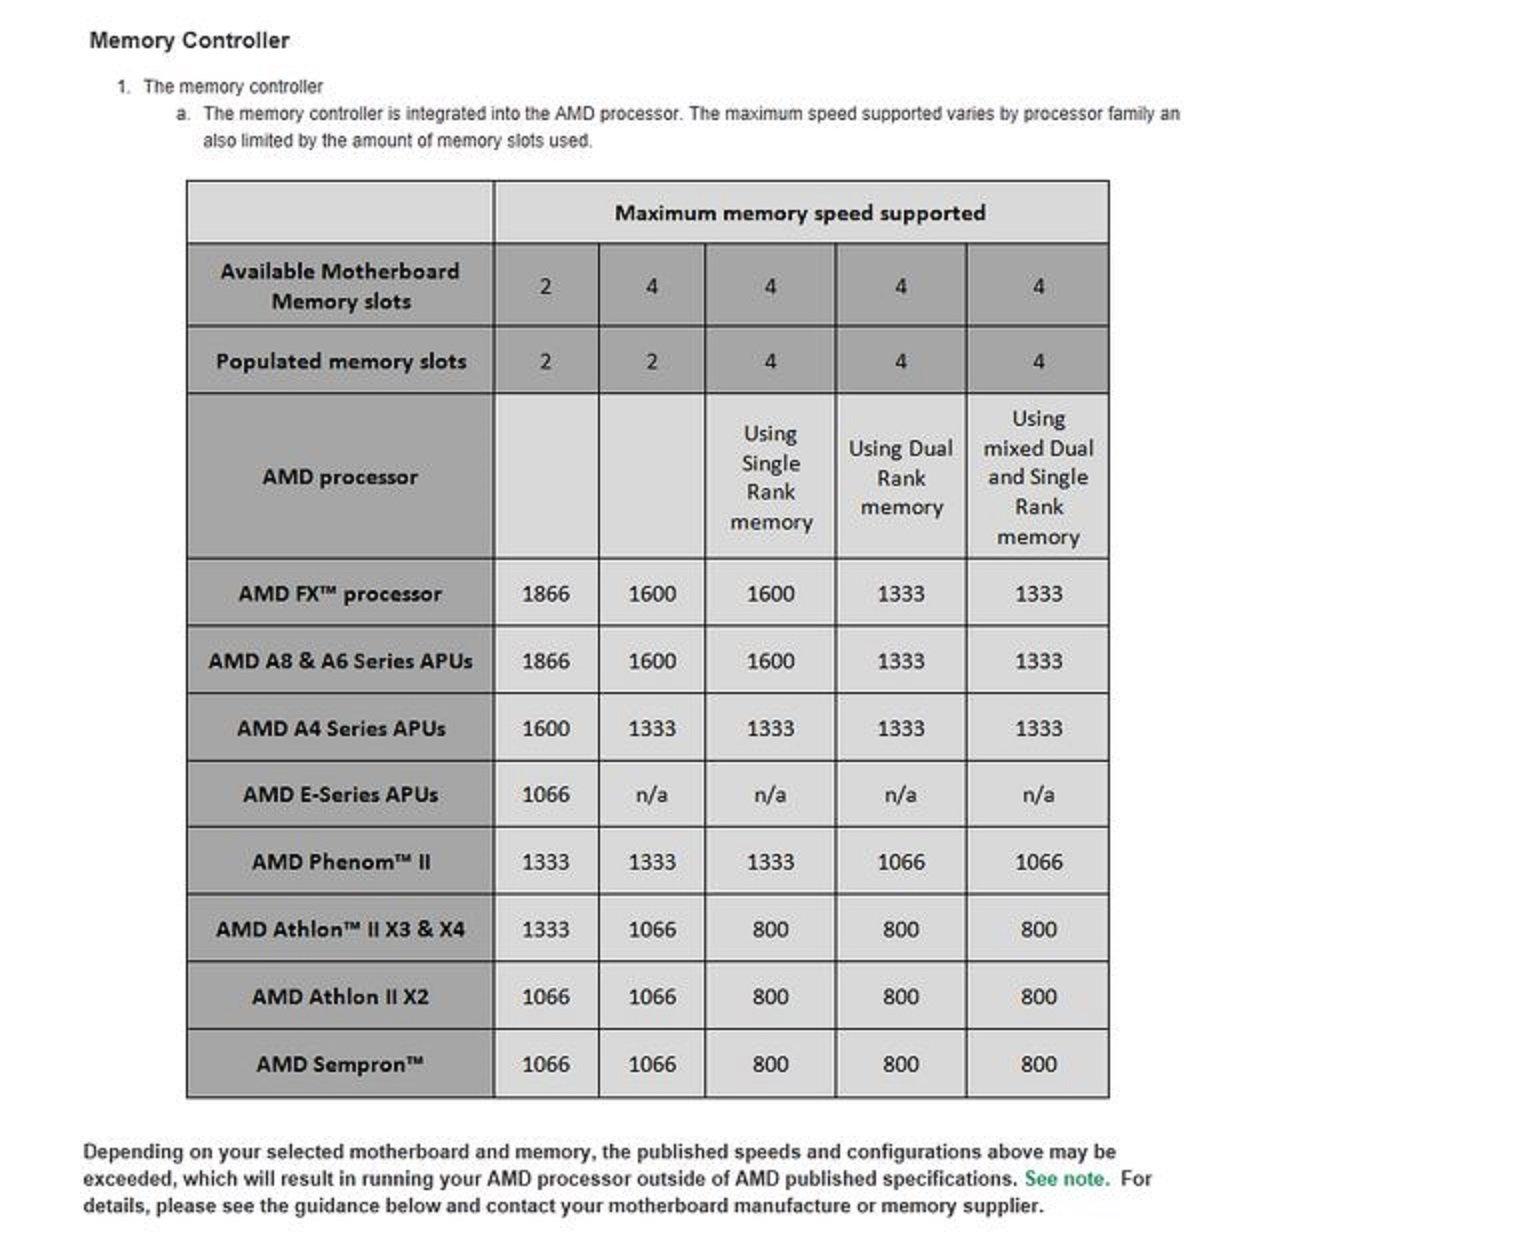 Corsair CMSX8GX3M1A1600C10 Vengeance 8GB (1x8GB) DDR3 1600 MHz (PC3 12800) Laptop Memory- 1.5V by Corsair